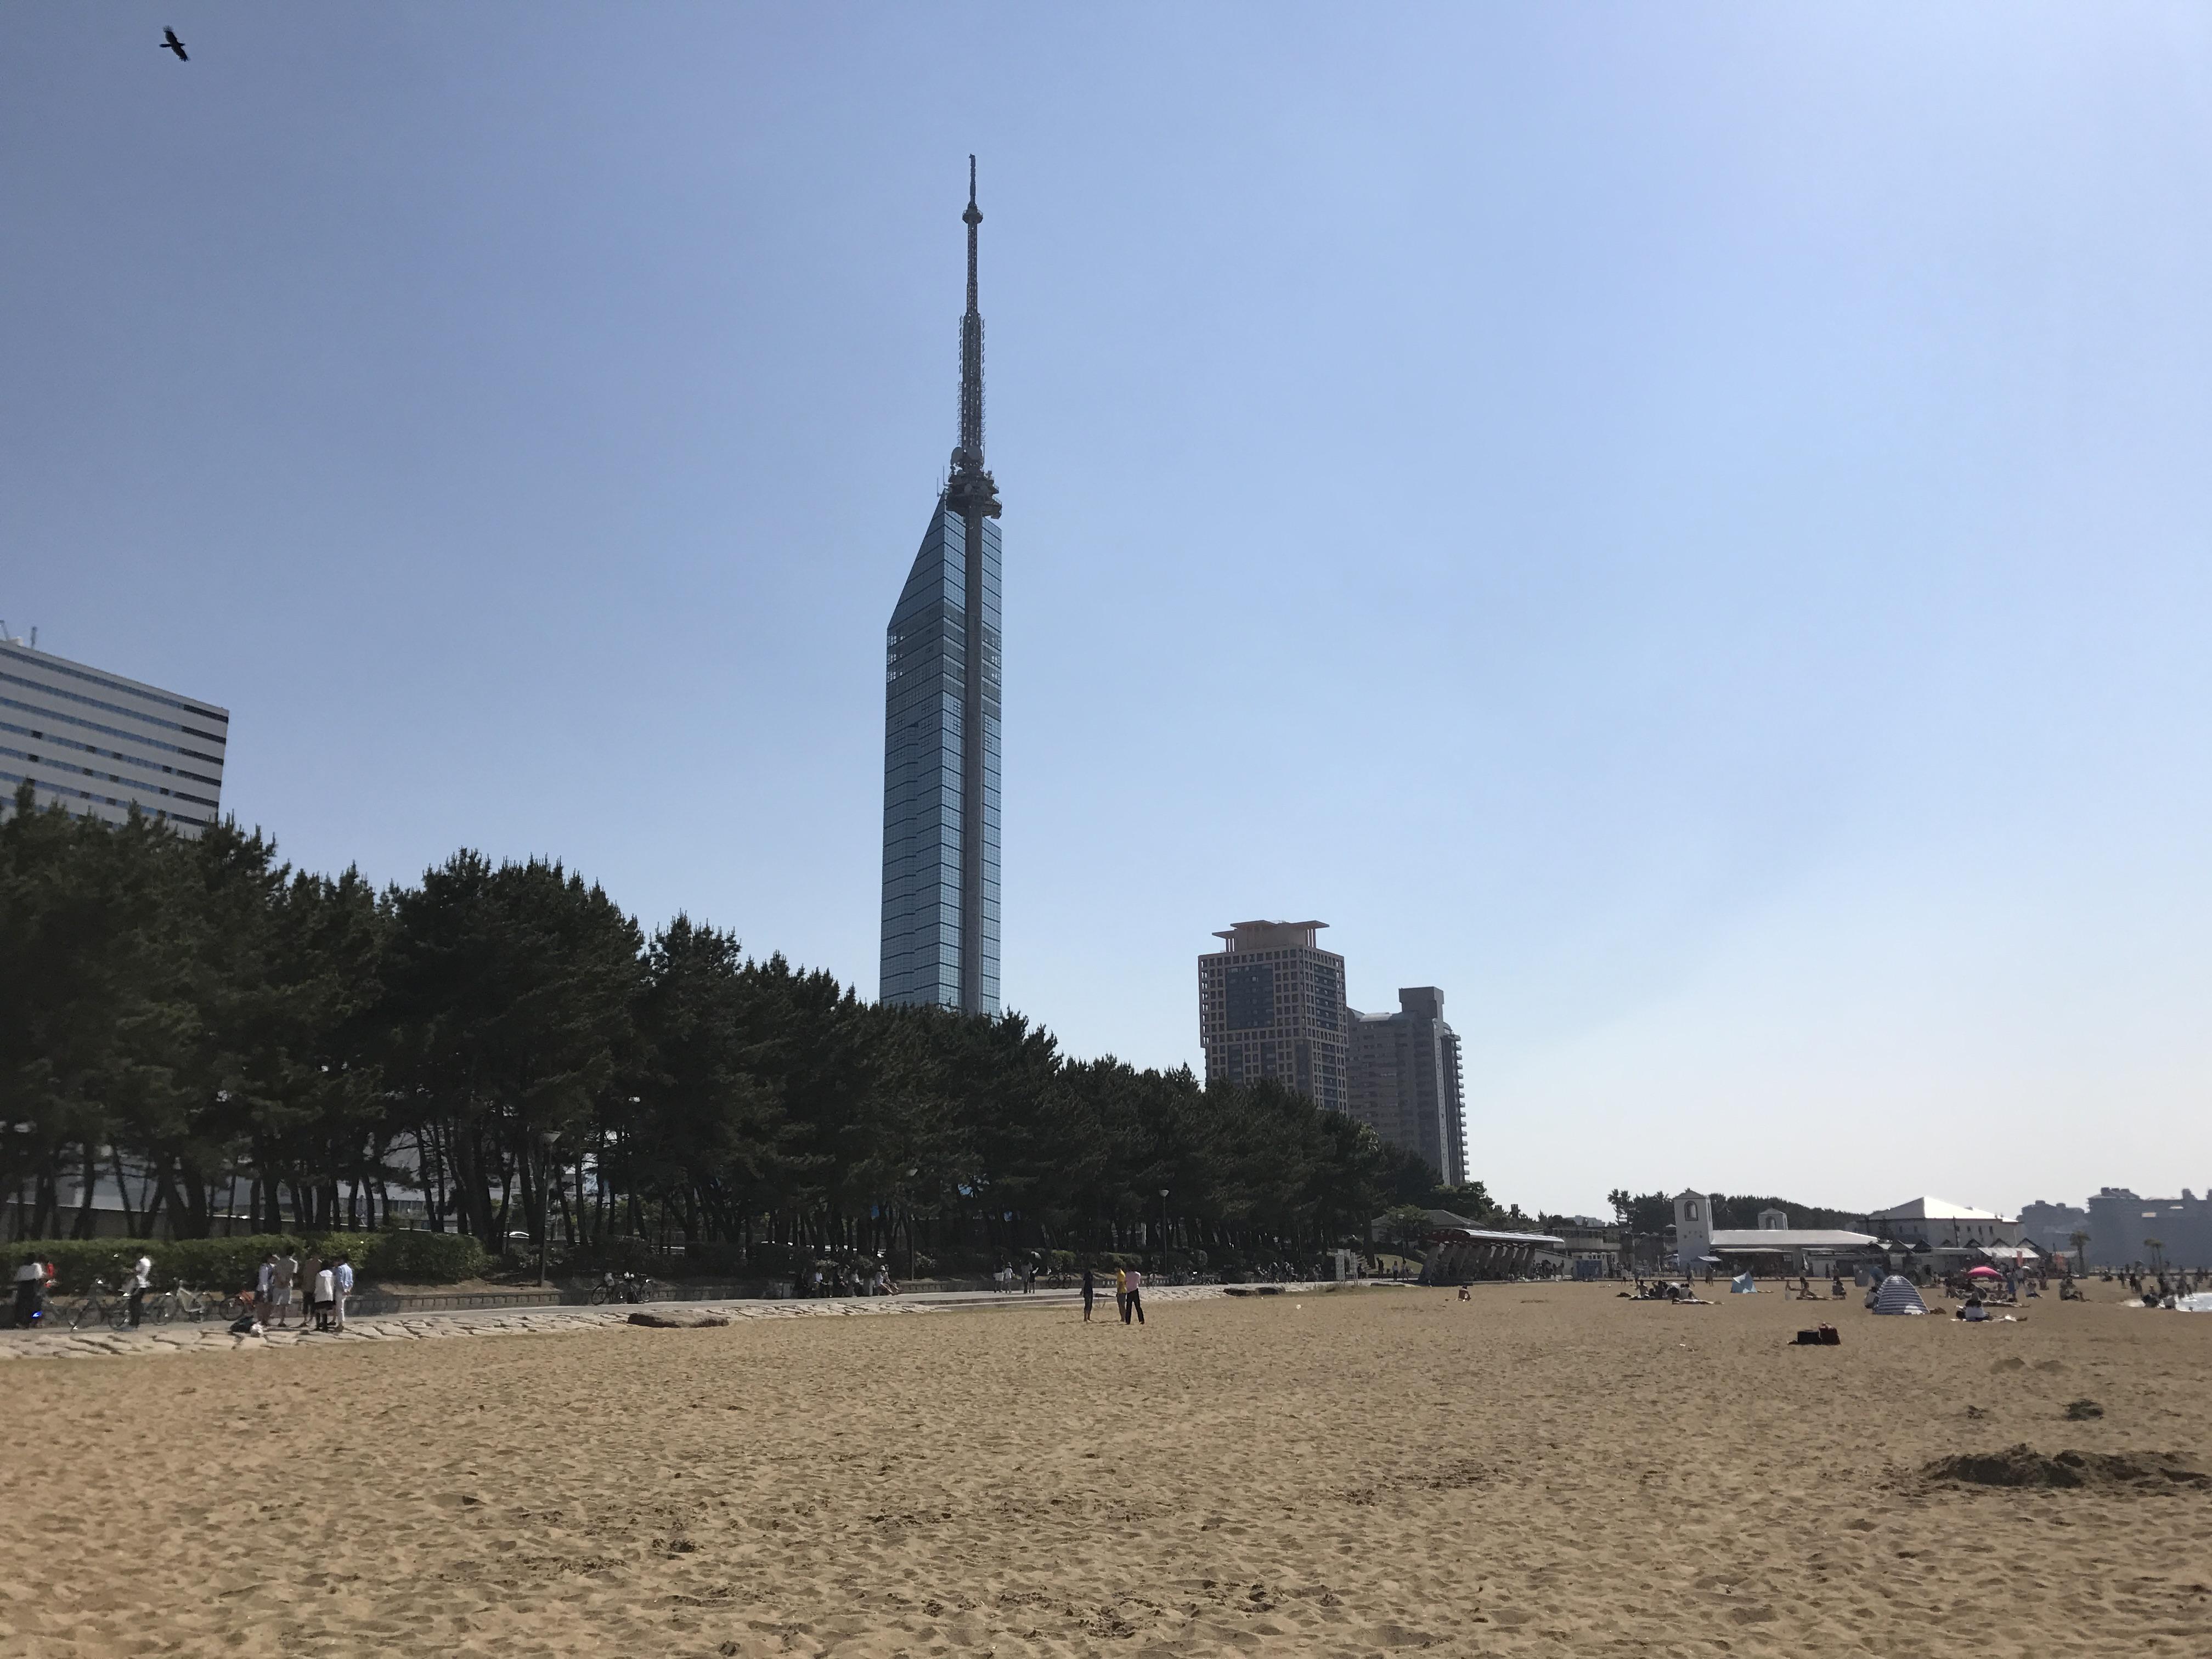 Beach of Seaside Momochi Seaside Park 3.jpg